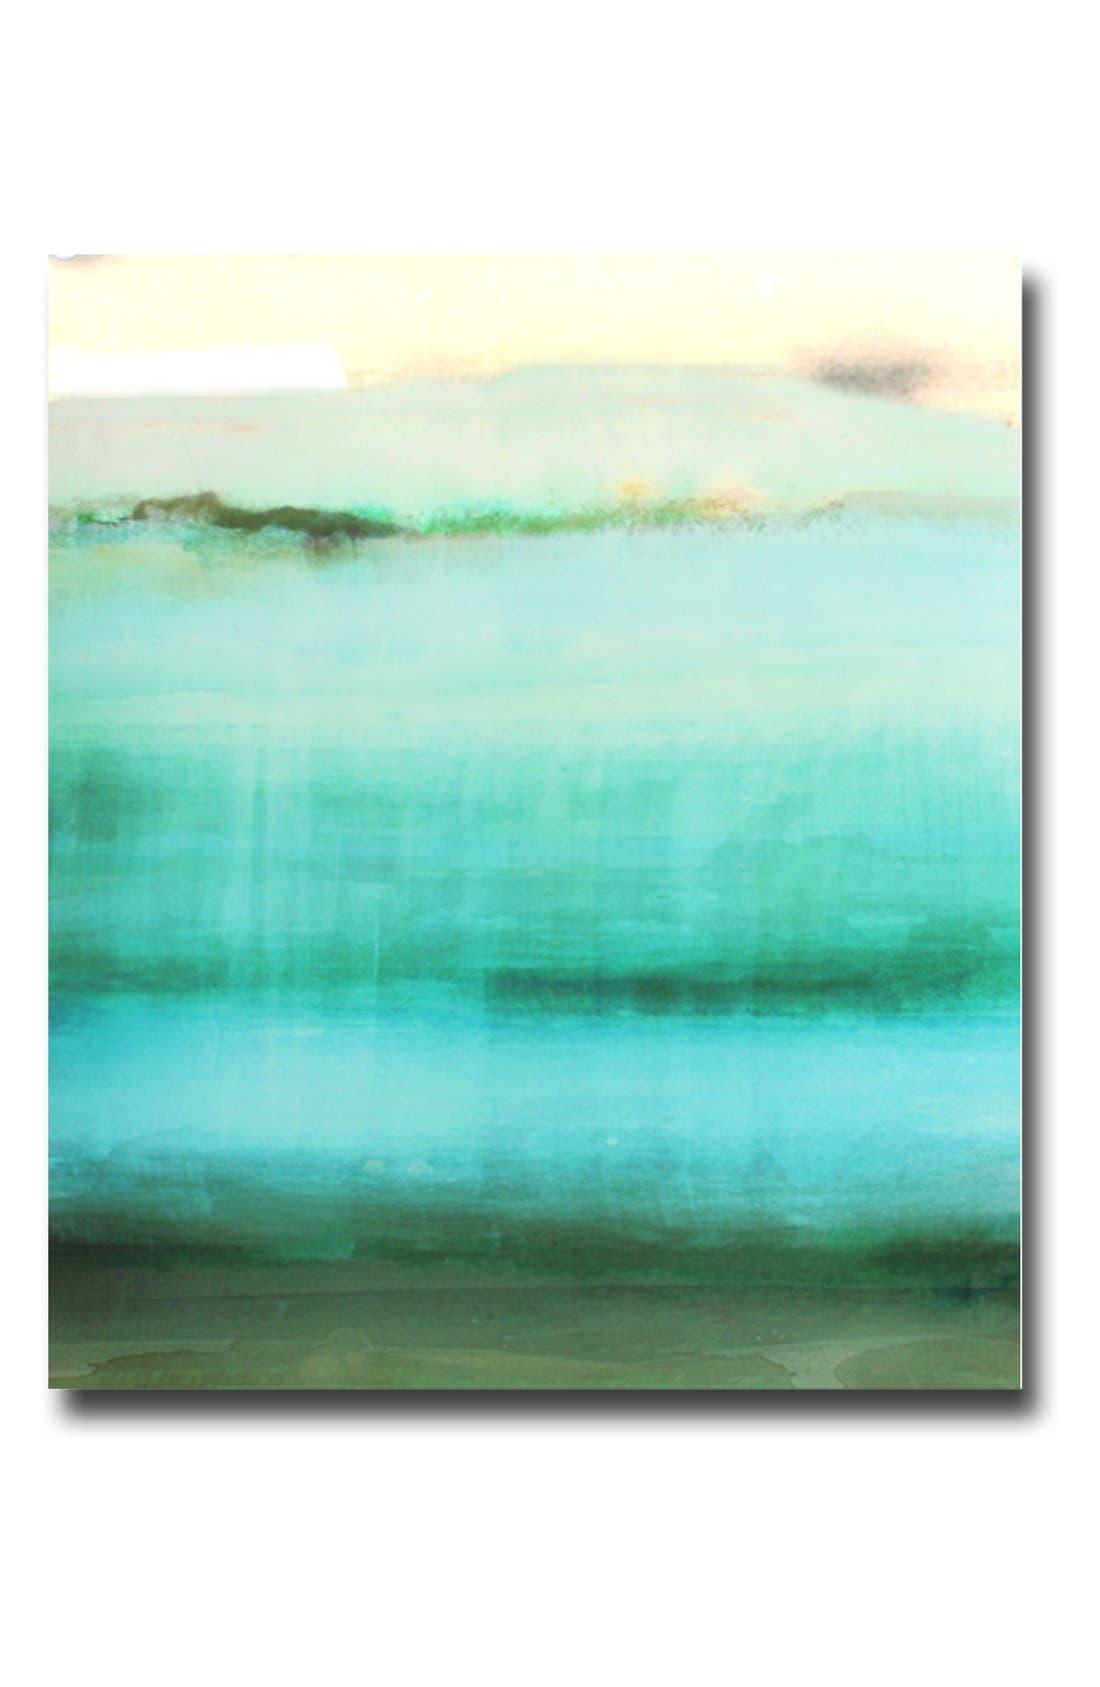 Main Image - Crystal Art Gallery 'Shades of Green' Canvas